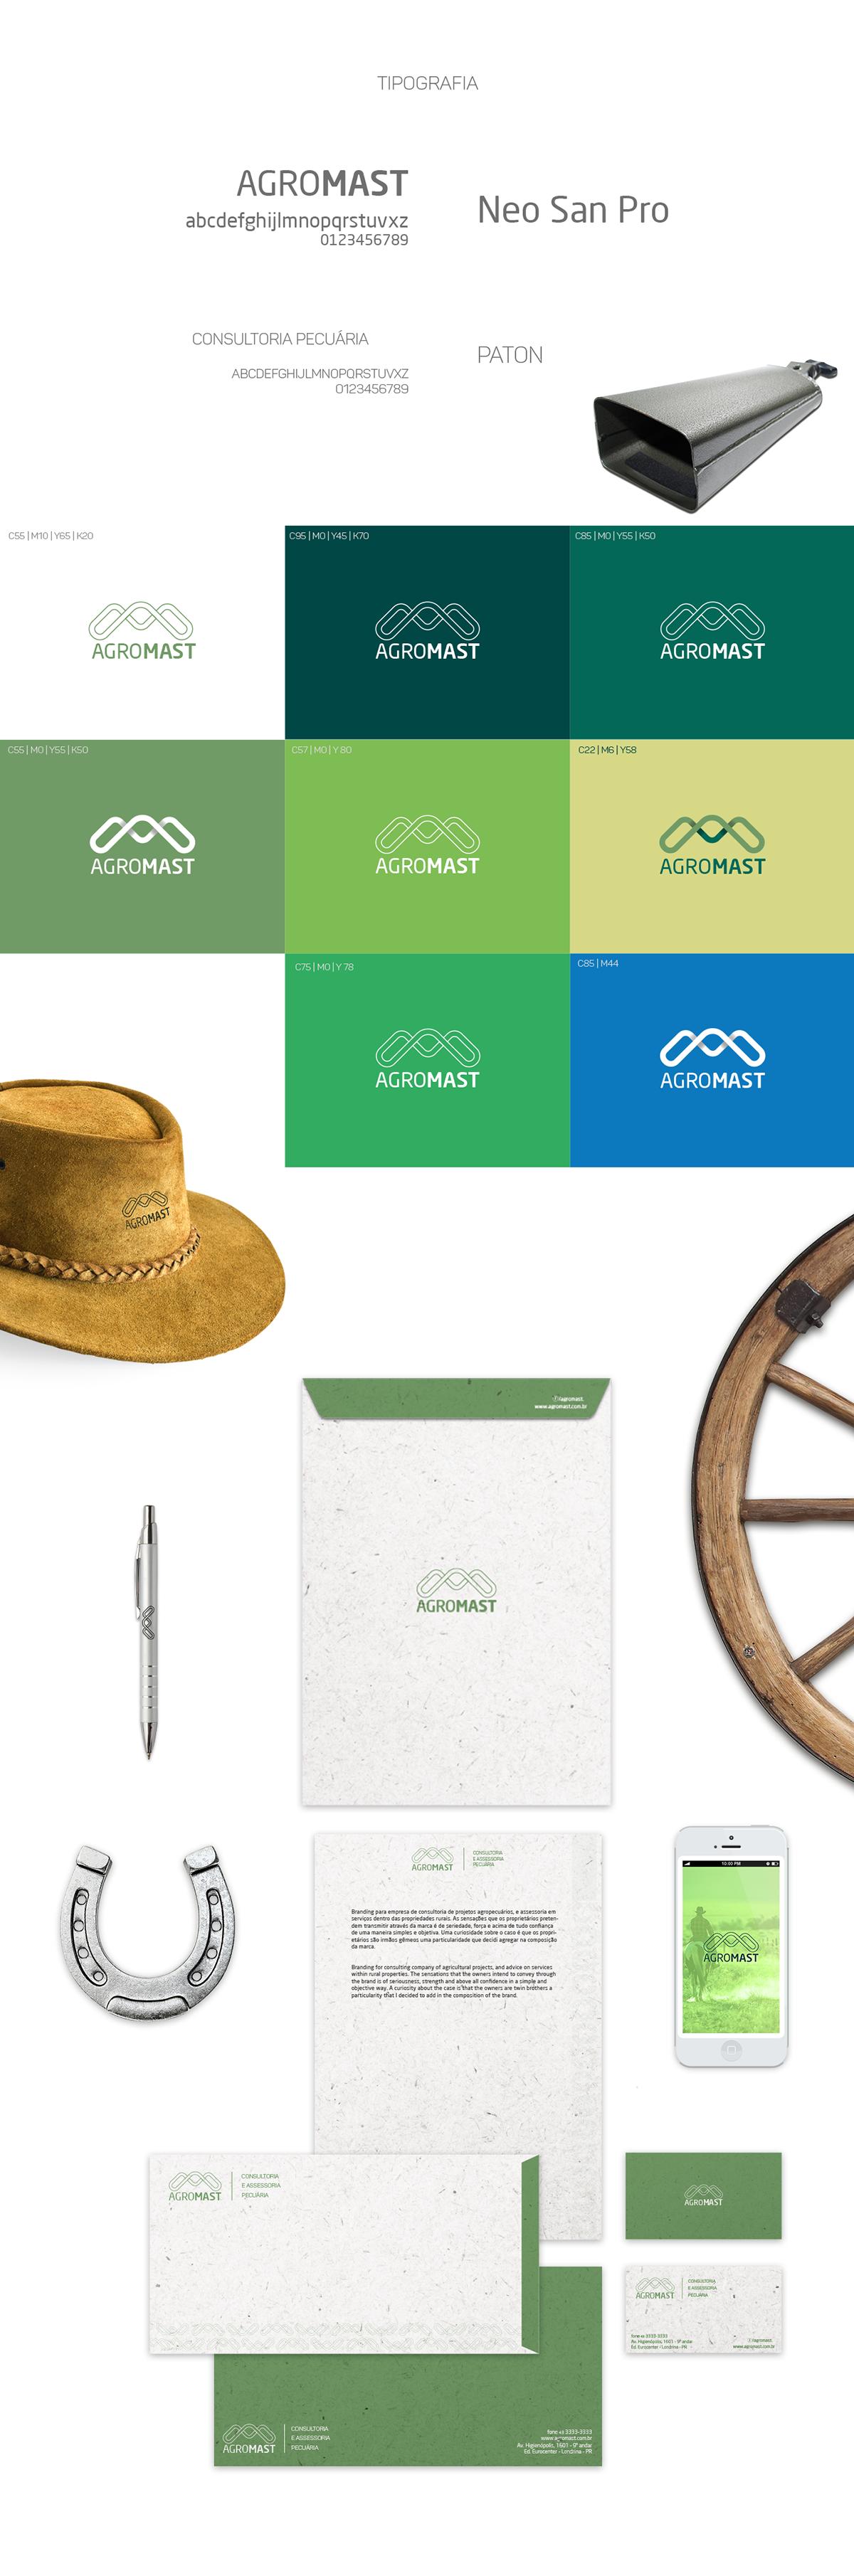 branding  marca Agronomy farming Livestock agropecuária agronomía pecuária agricultura gêmeos